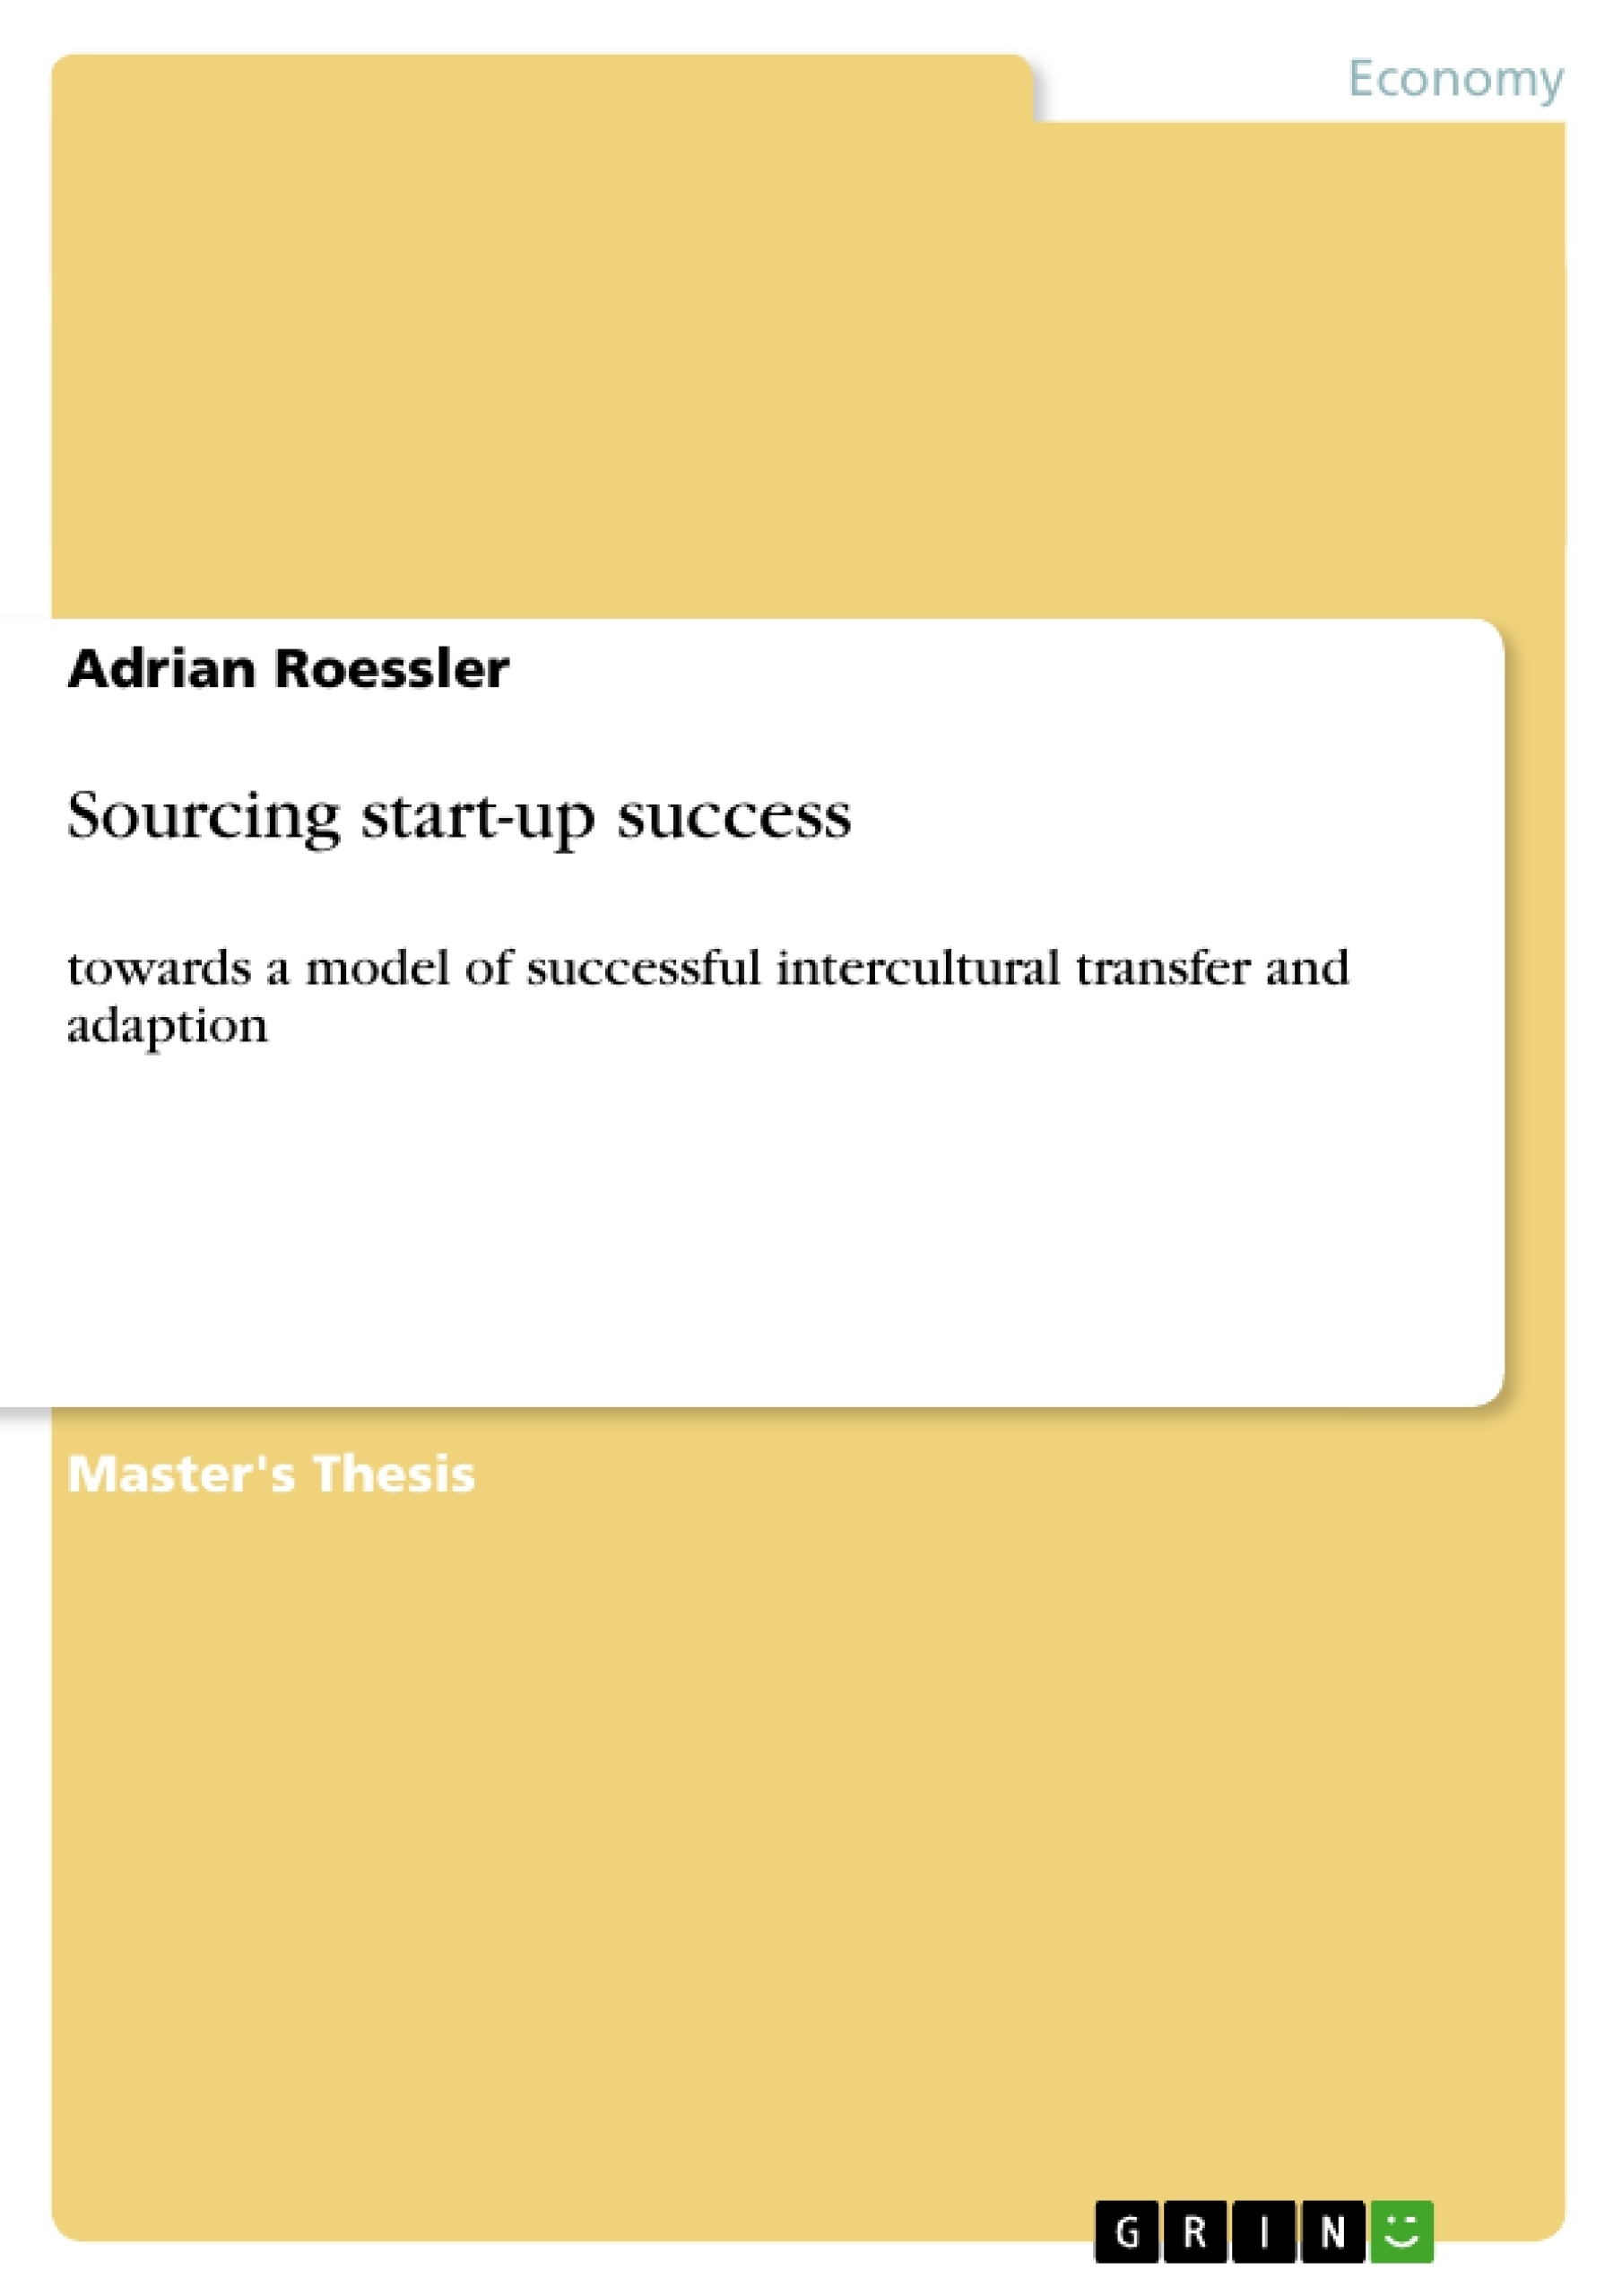 Title: Sourcing start-up success